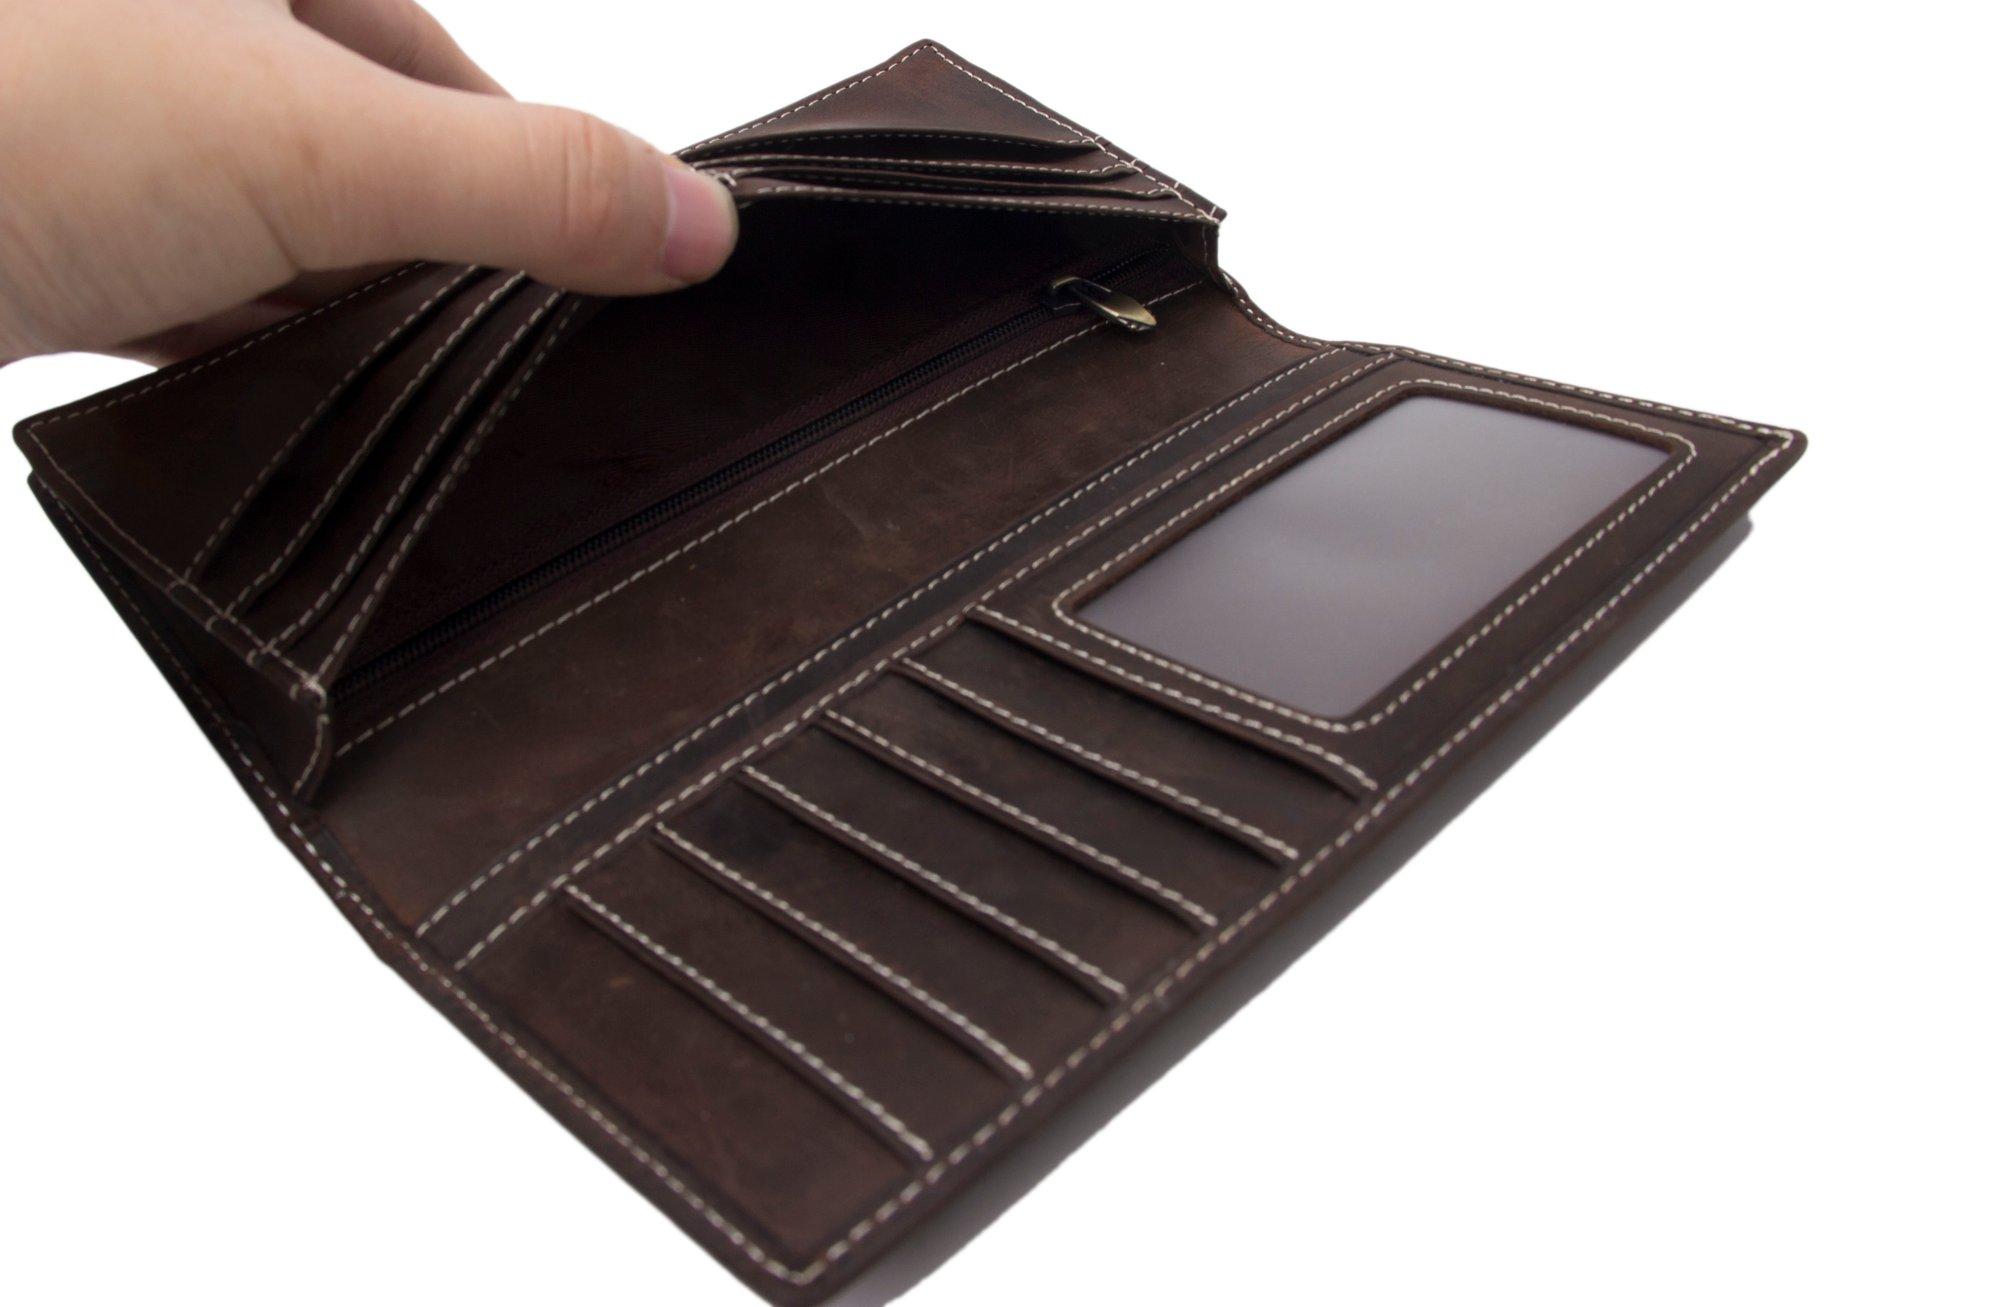 eec4ad36304d Handmade Genuine Leather Wallet Men Long Wallet Money Purse Card Holder  196-1